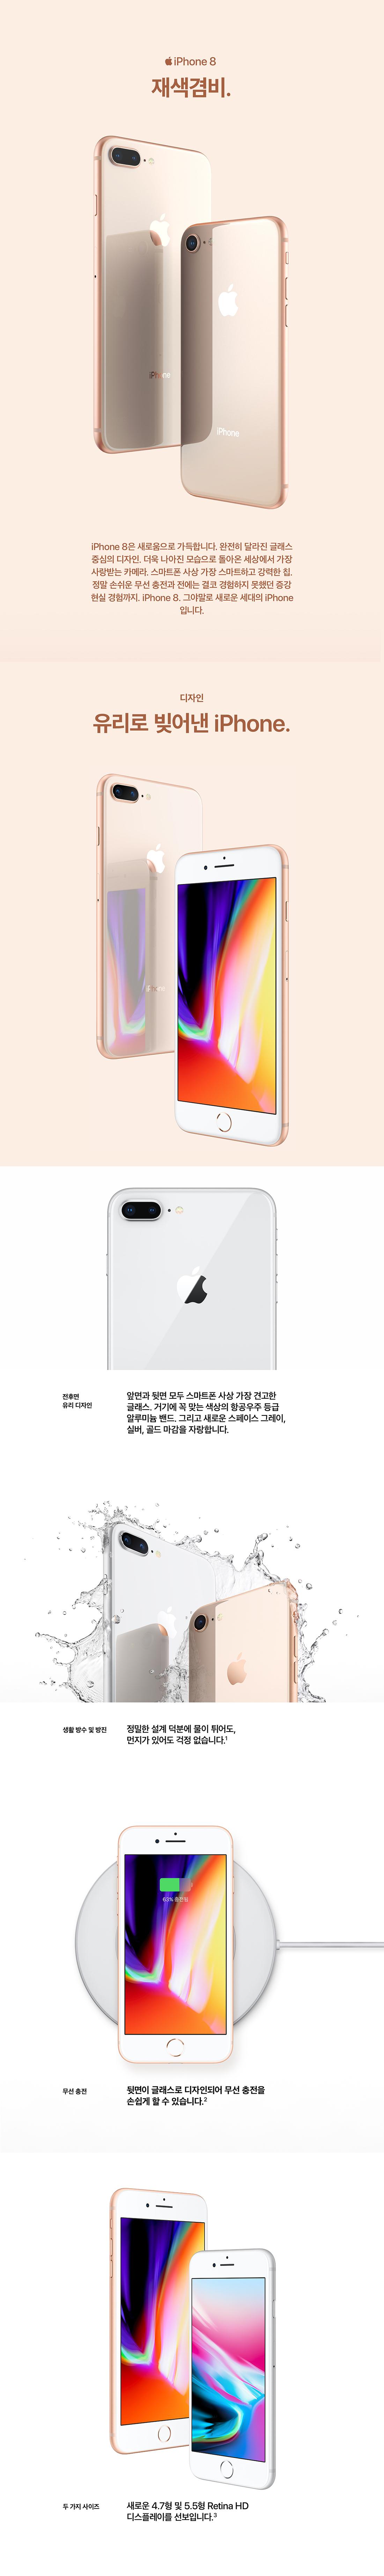 iPhone 8. 재색겸비. iPhone 8은 새로움으로 가득합니다. 디자인(자세한 내용은 하단 문구 참조)